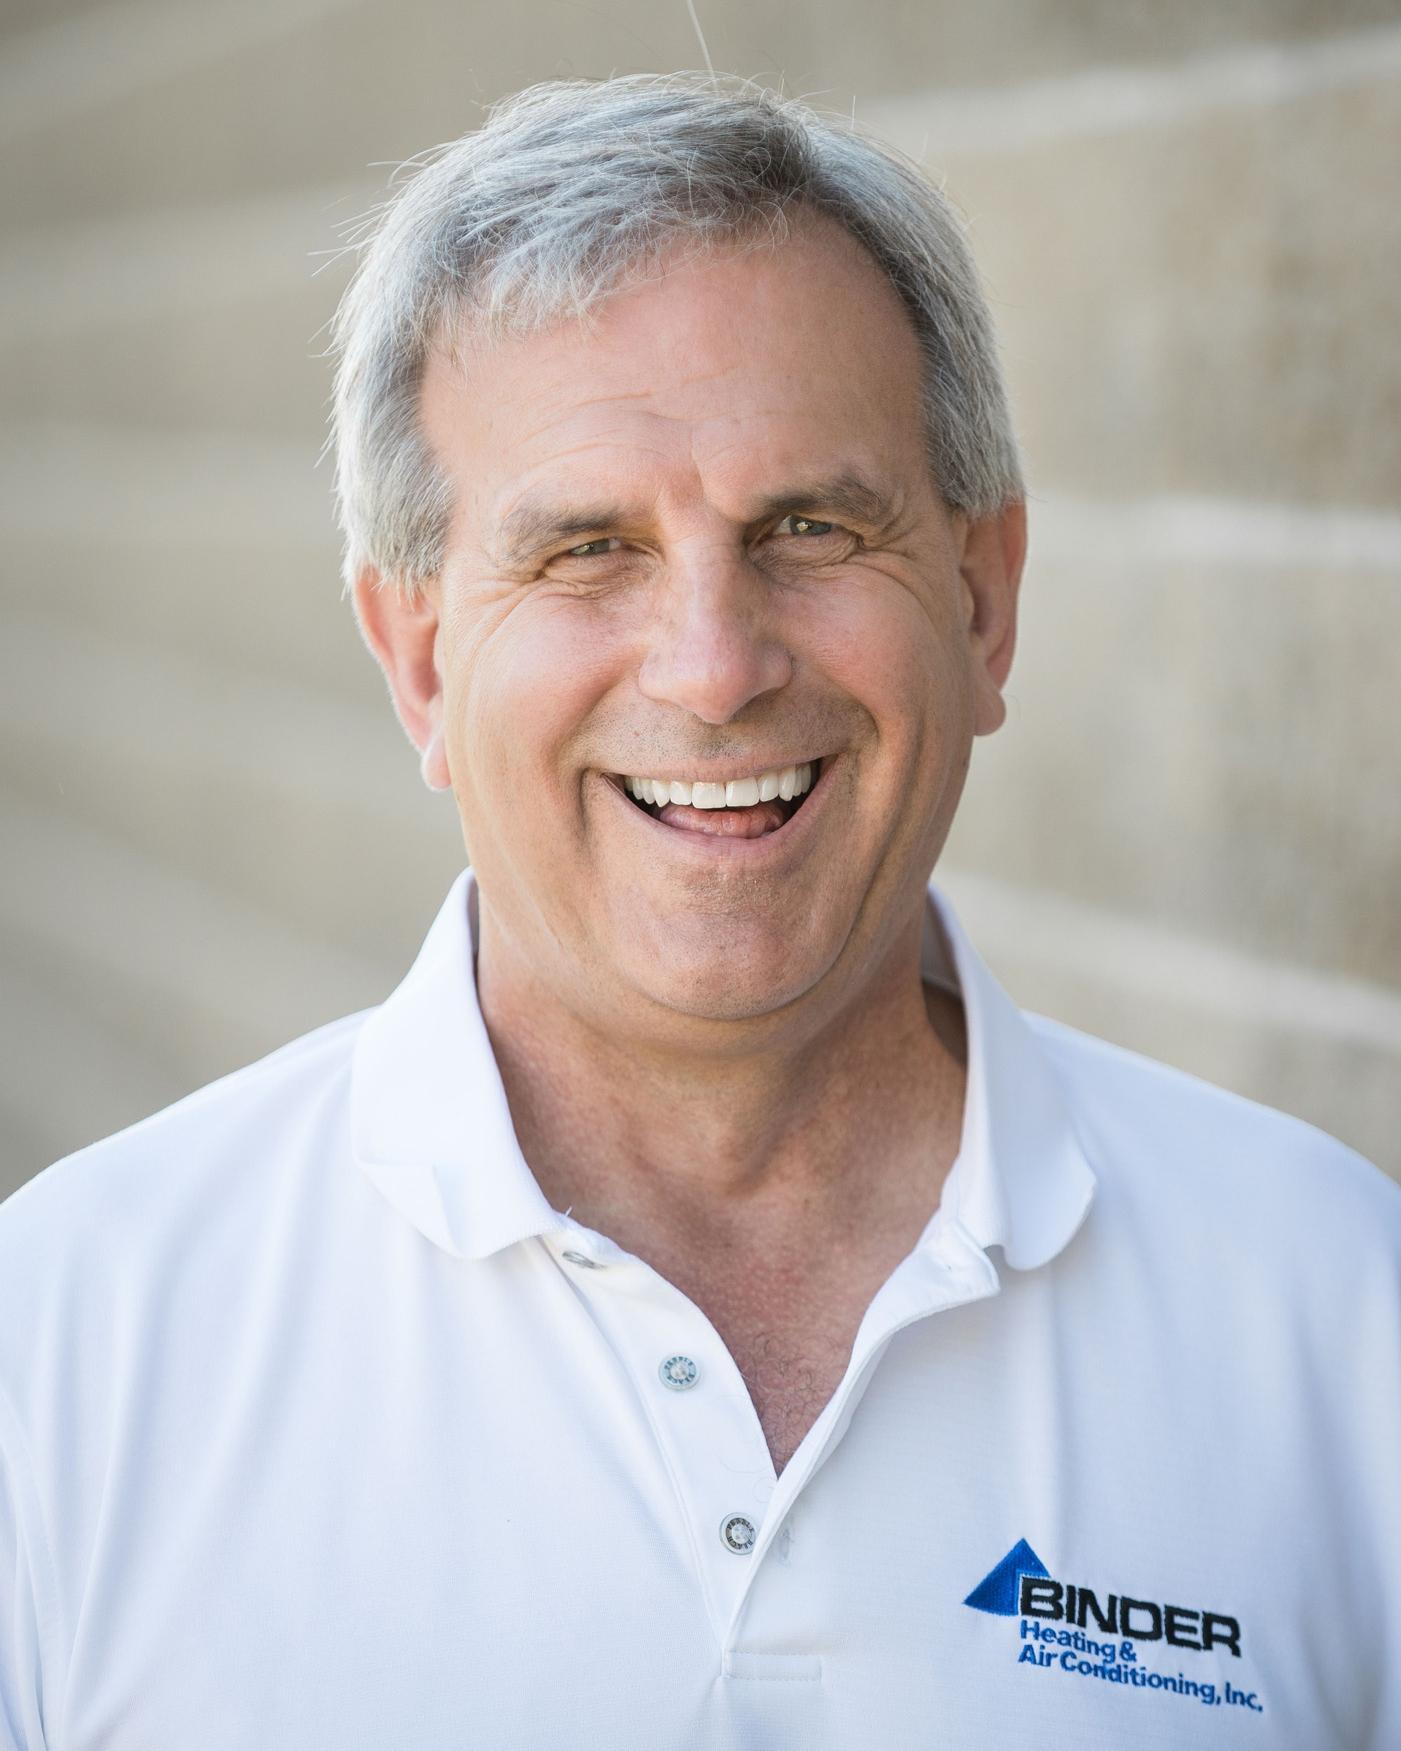 Rick Binder